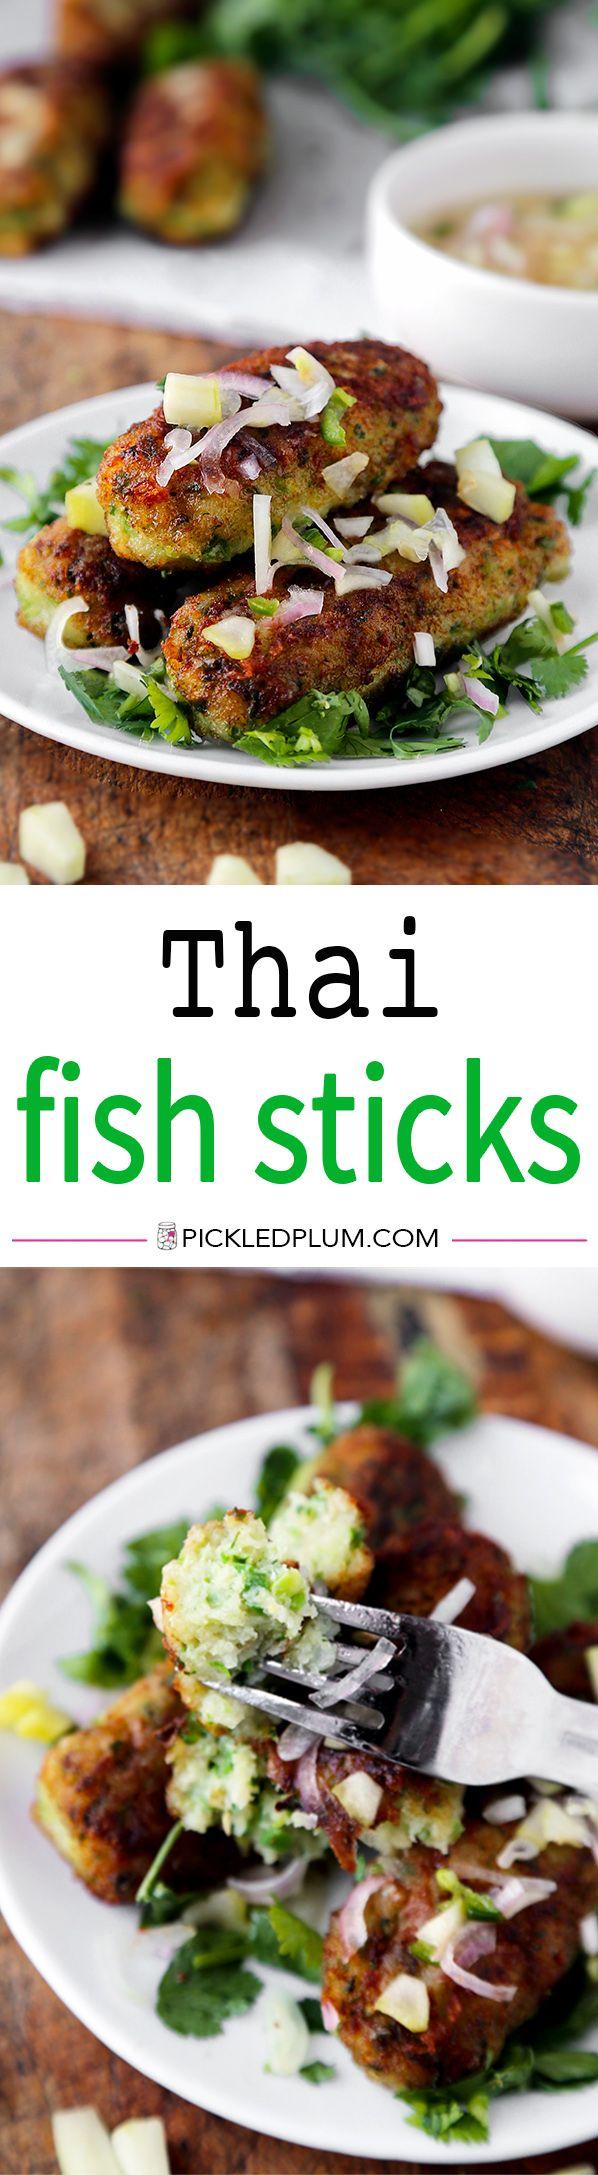 Fish sticks thai recipe thai food recipes dipping sauces and fish sticks thai thai food recipessushi recipesketo recipeshealthy forumfinder Choice Image